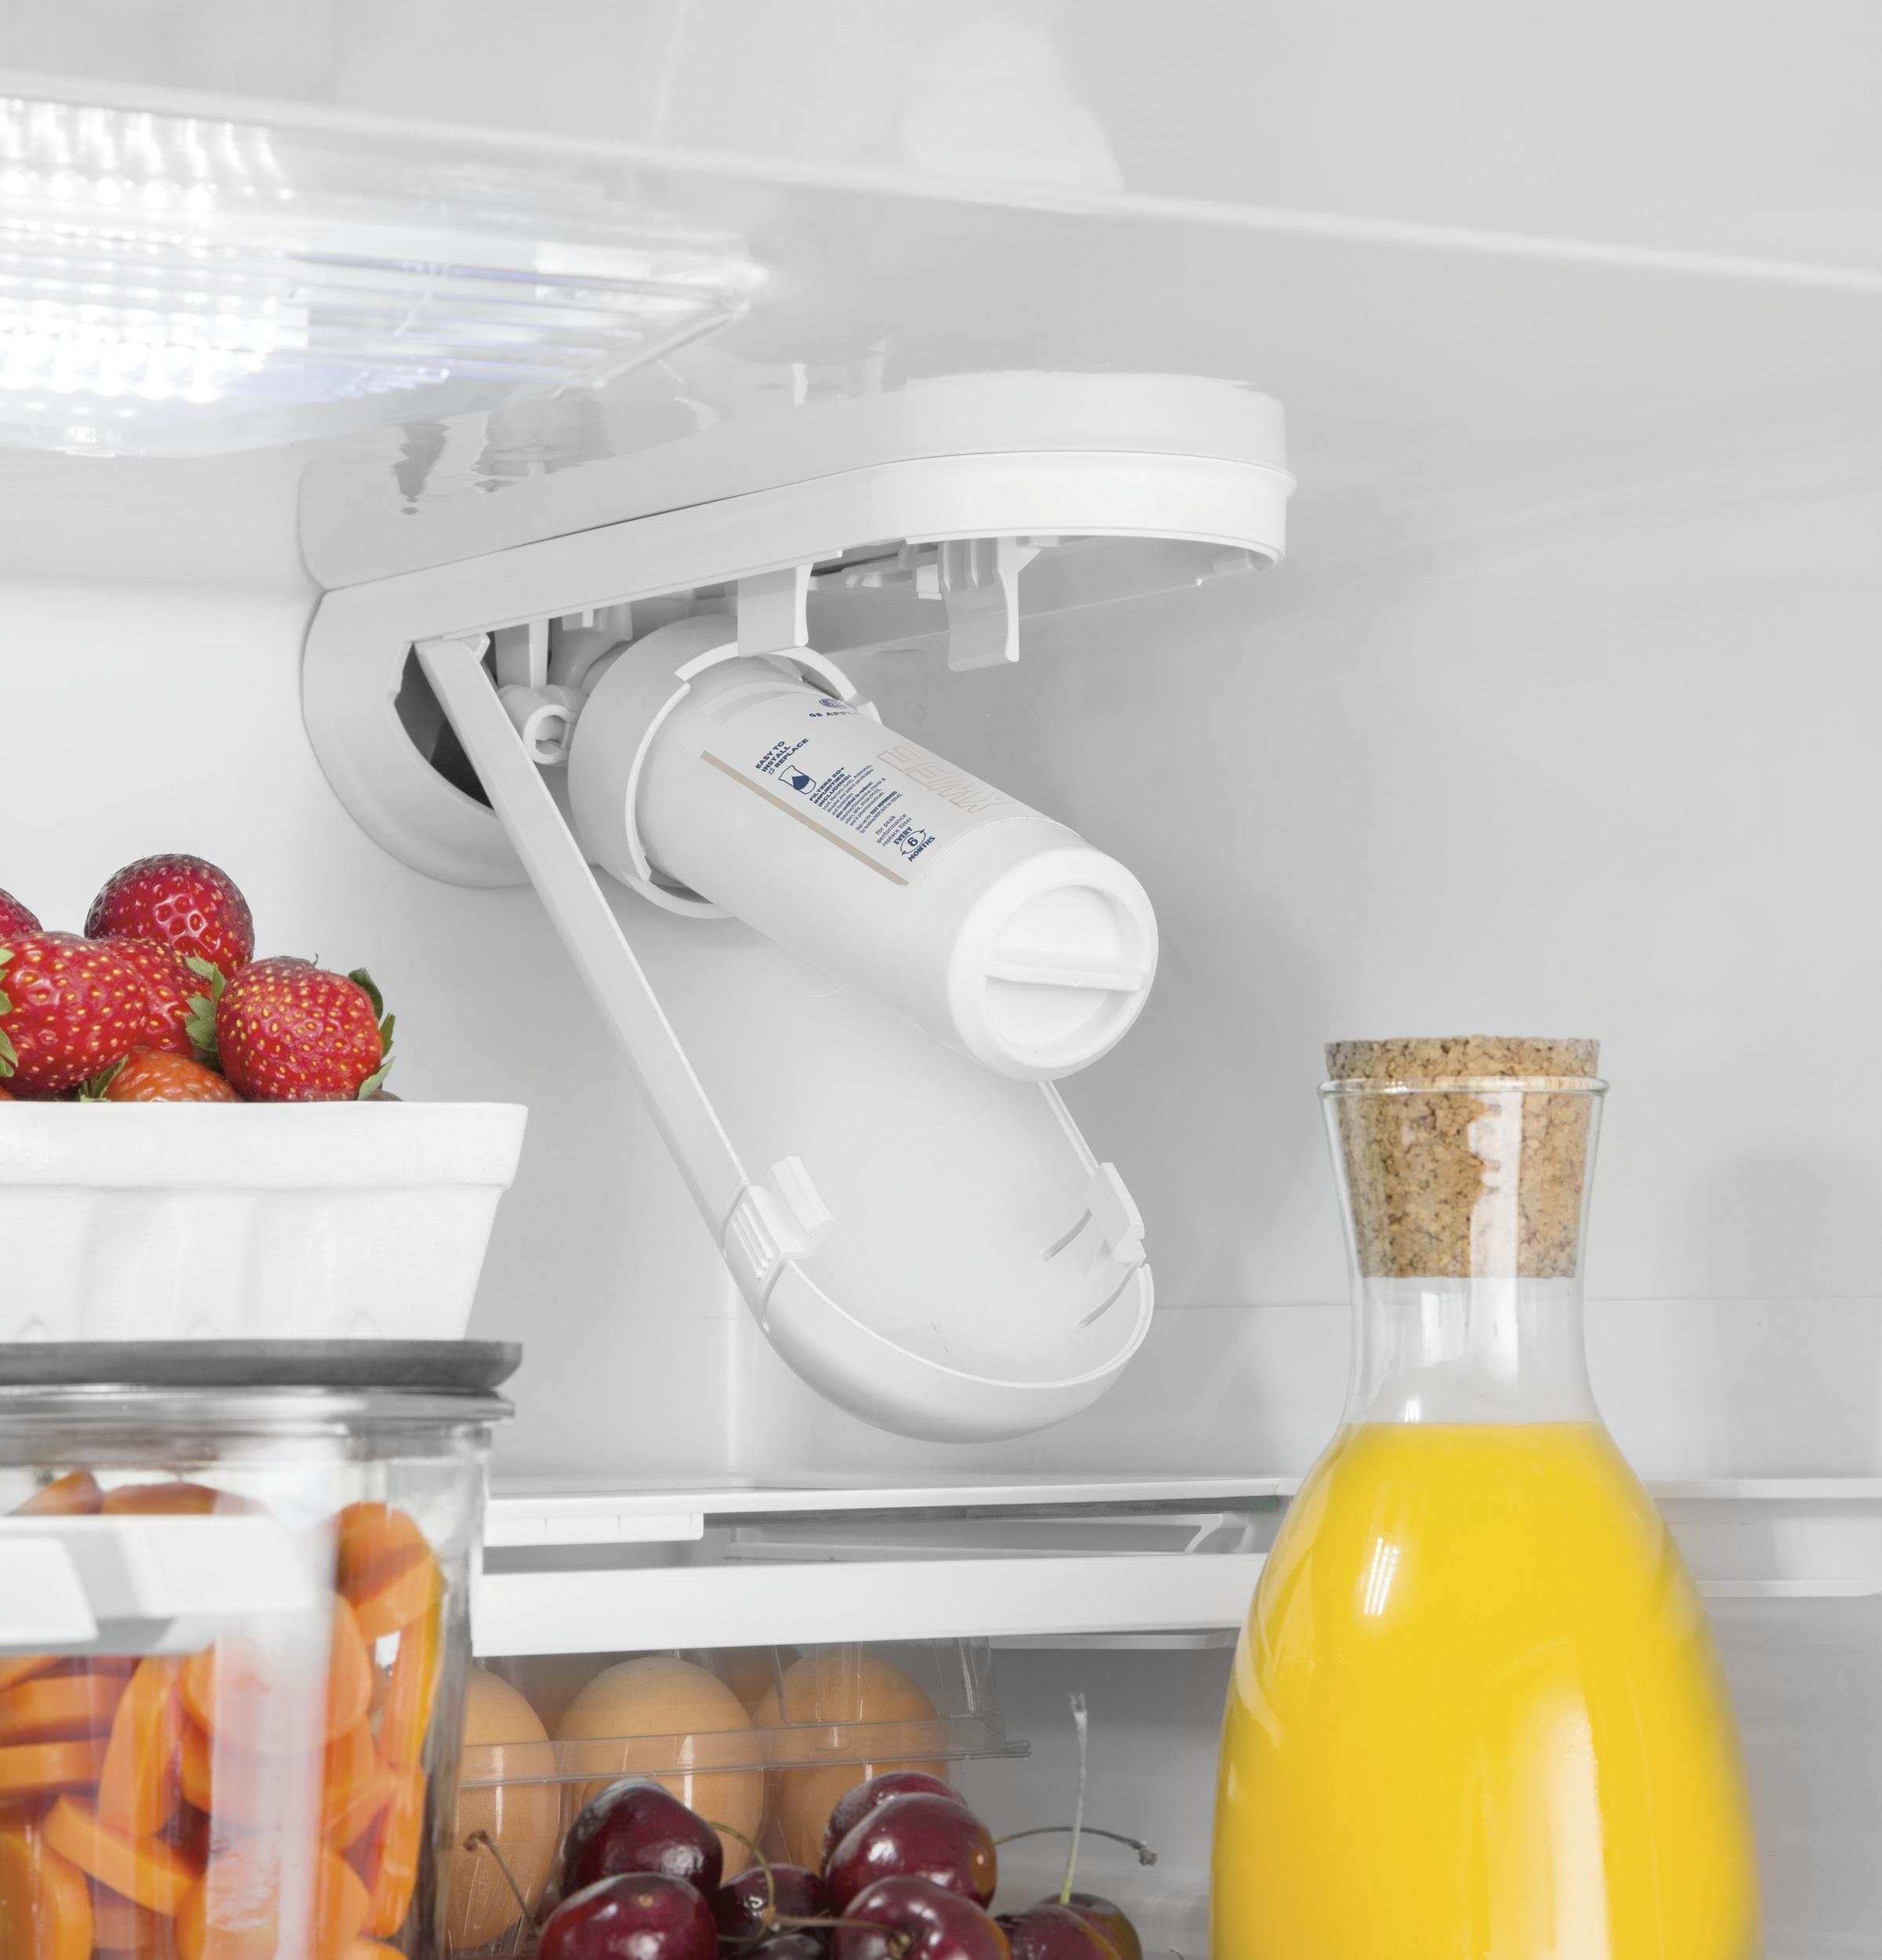 Model: GNE27JSMSS   GE GE® ENERGY STAR® 27.0 Cu. Ft. French-Door Refrigerator